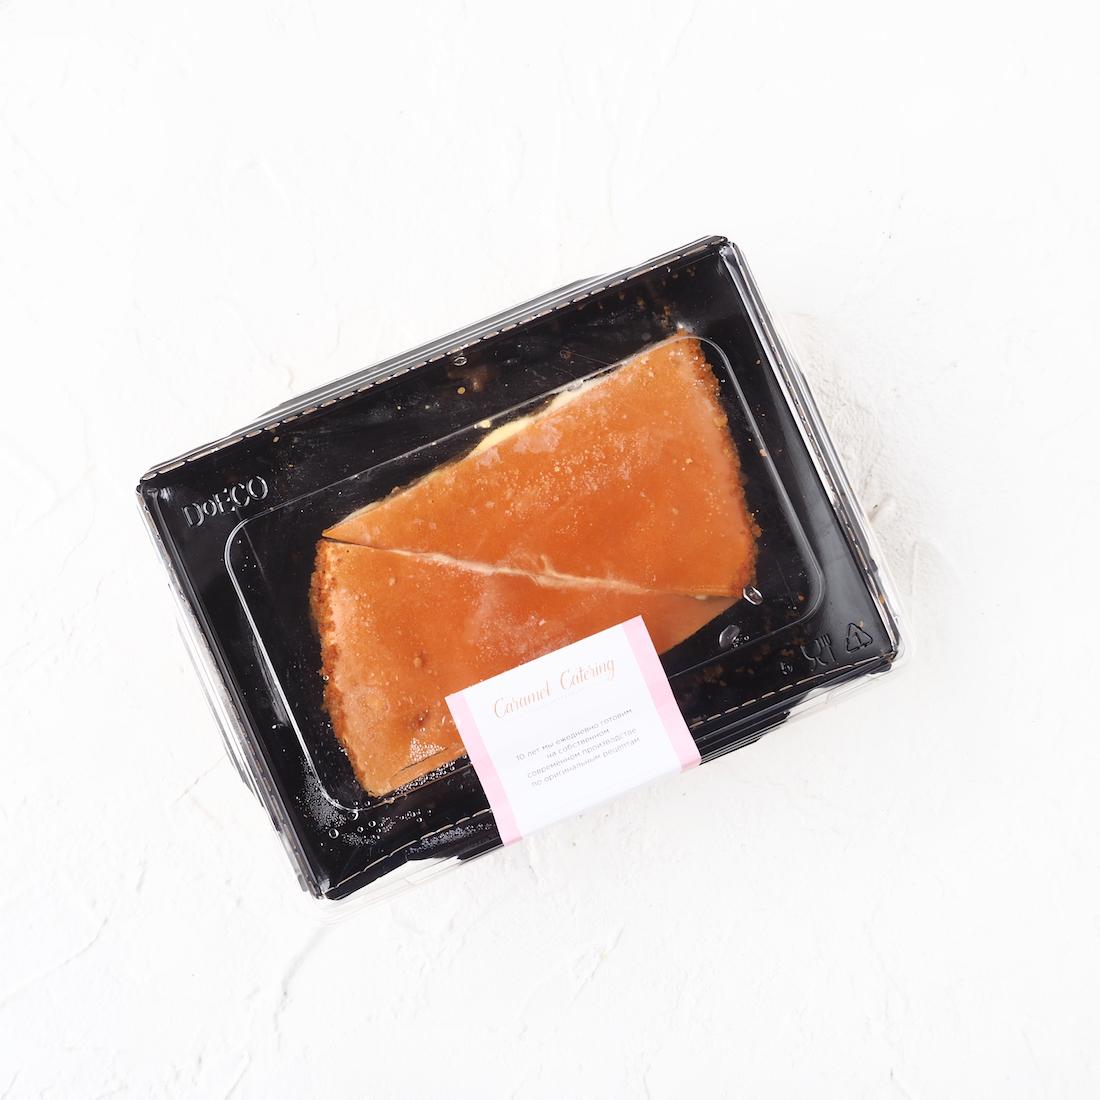 Замороженный морковный торт (2 шт., 220 г)